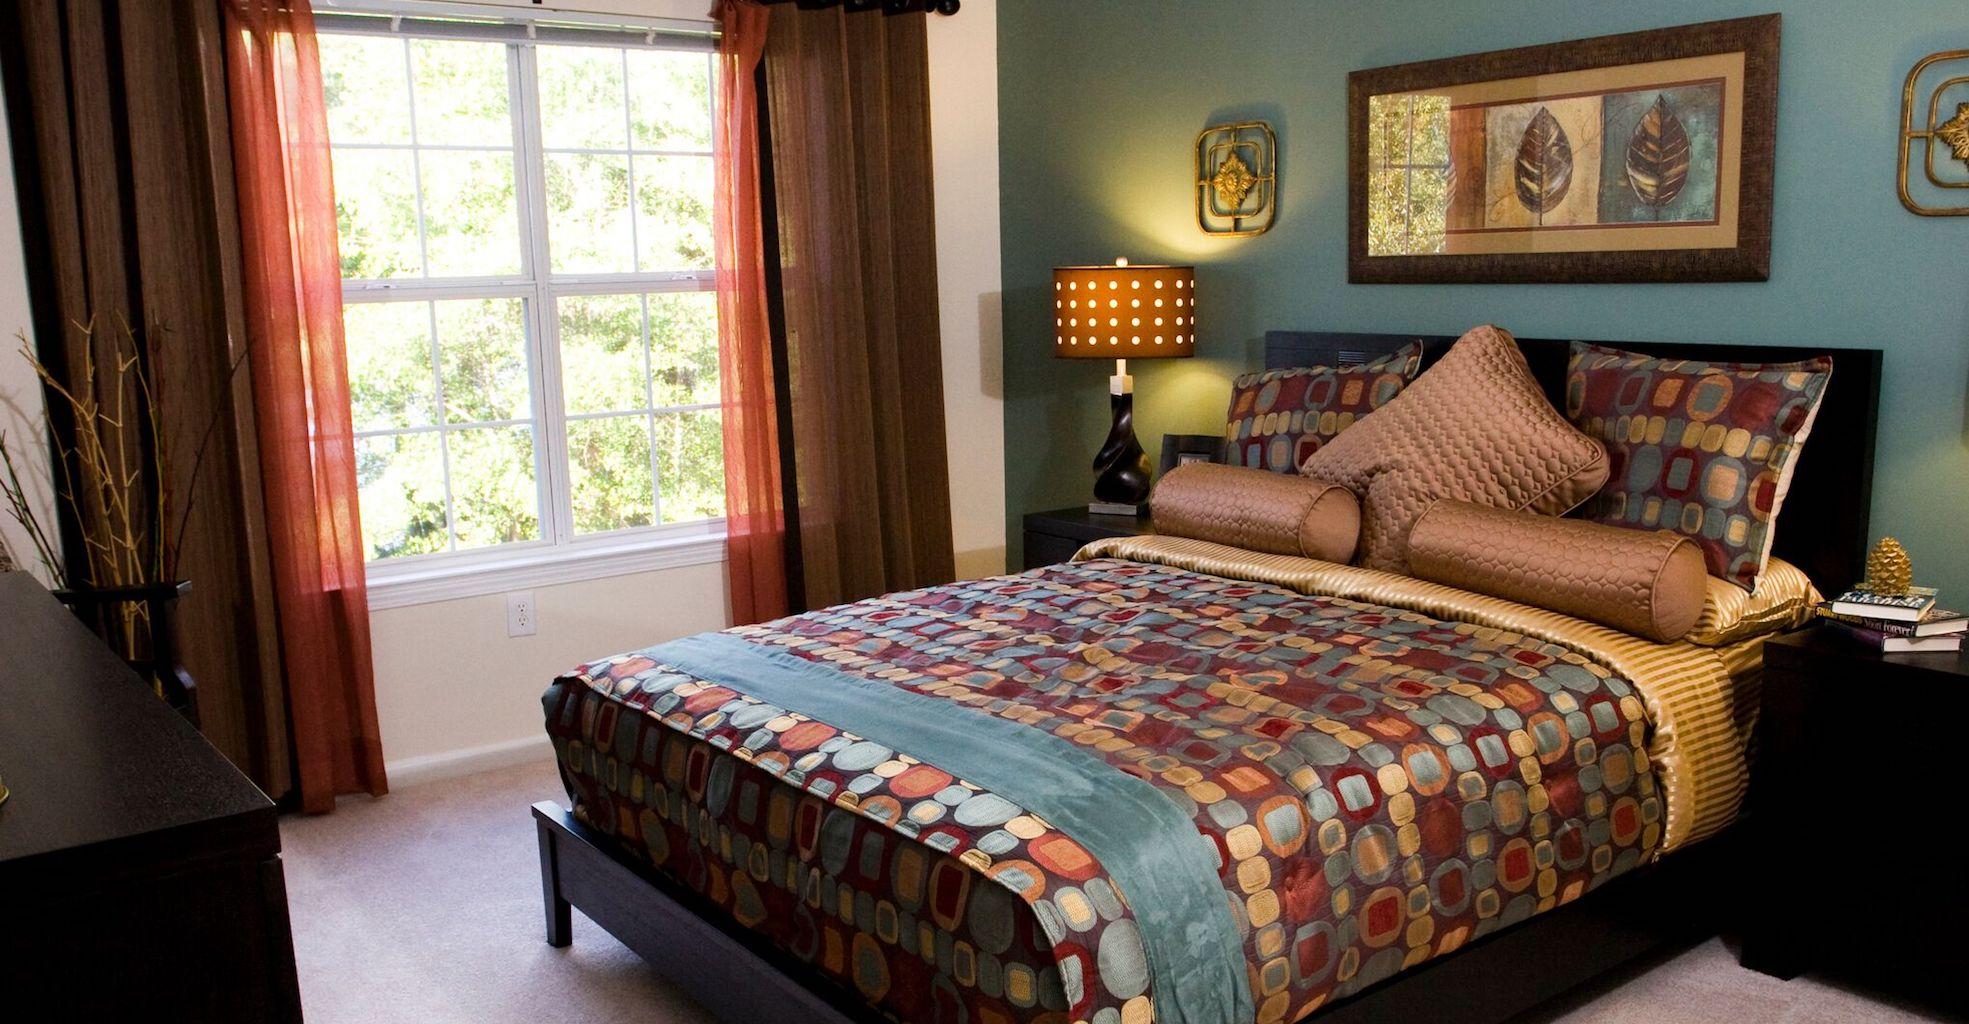 The Reserve At Mill Landing Bedroom Lexington, SC 29072, Columbia, SC